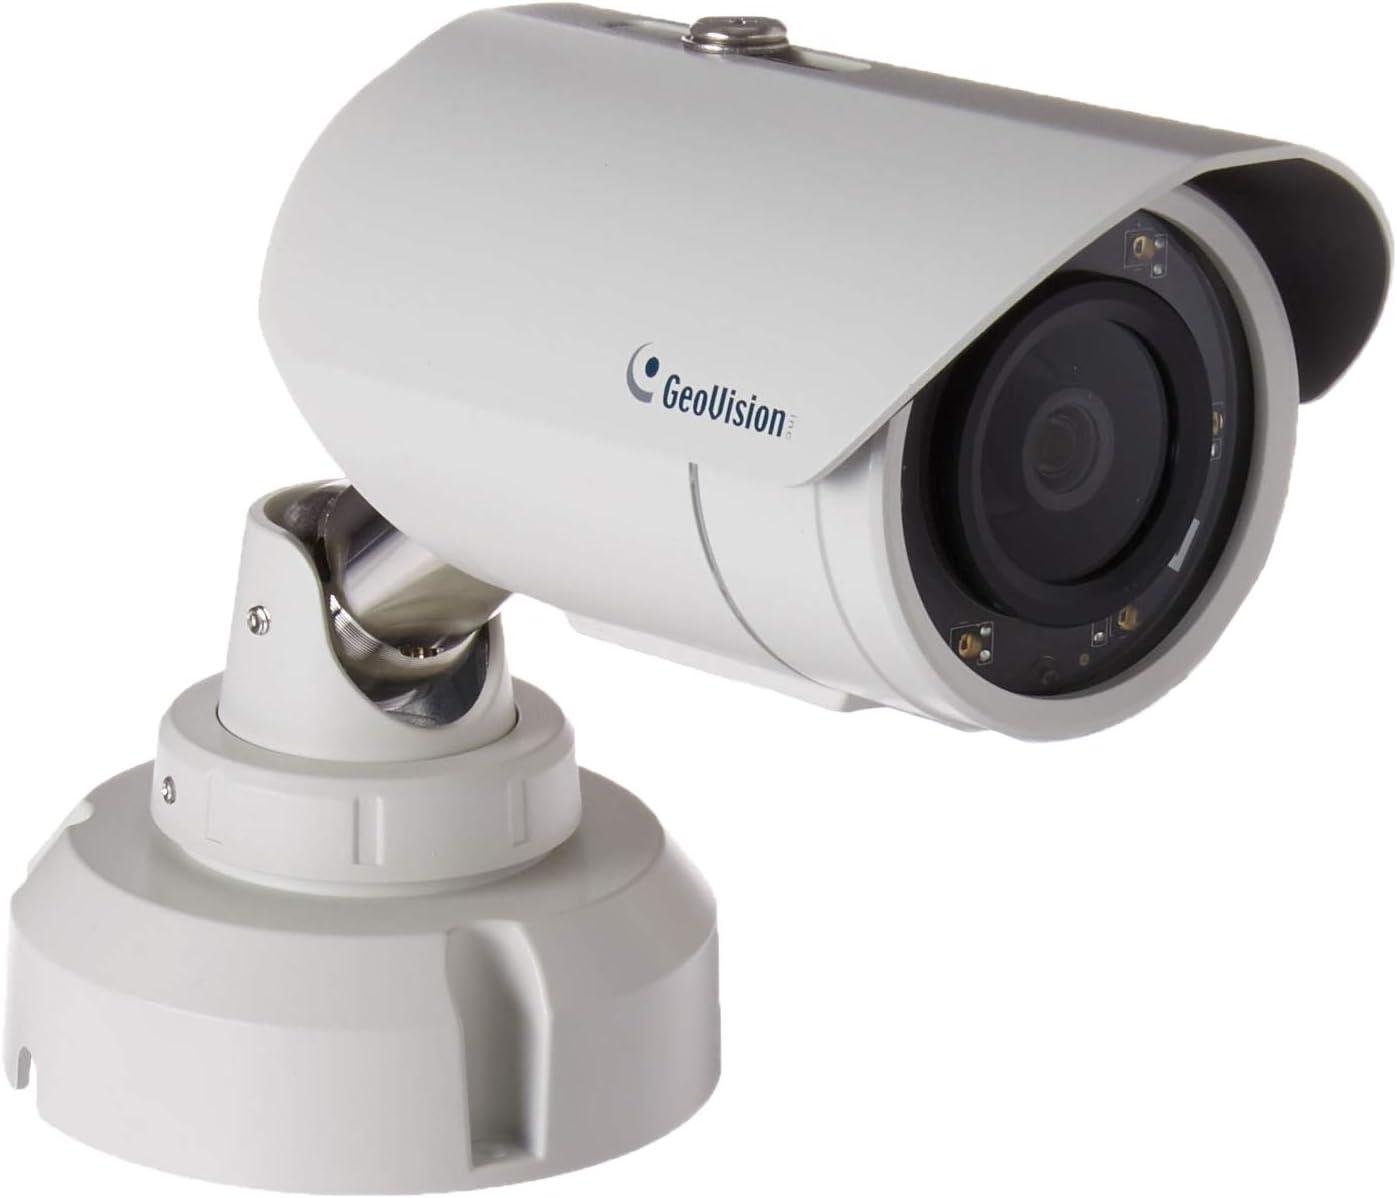 GeoVision 2MP H.265 3.8mm IR Bullet Camera, White GV-EBL2702-2F